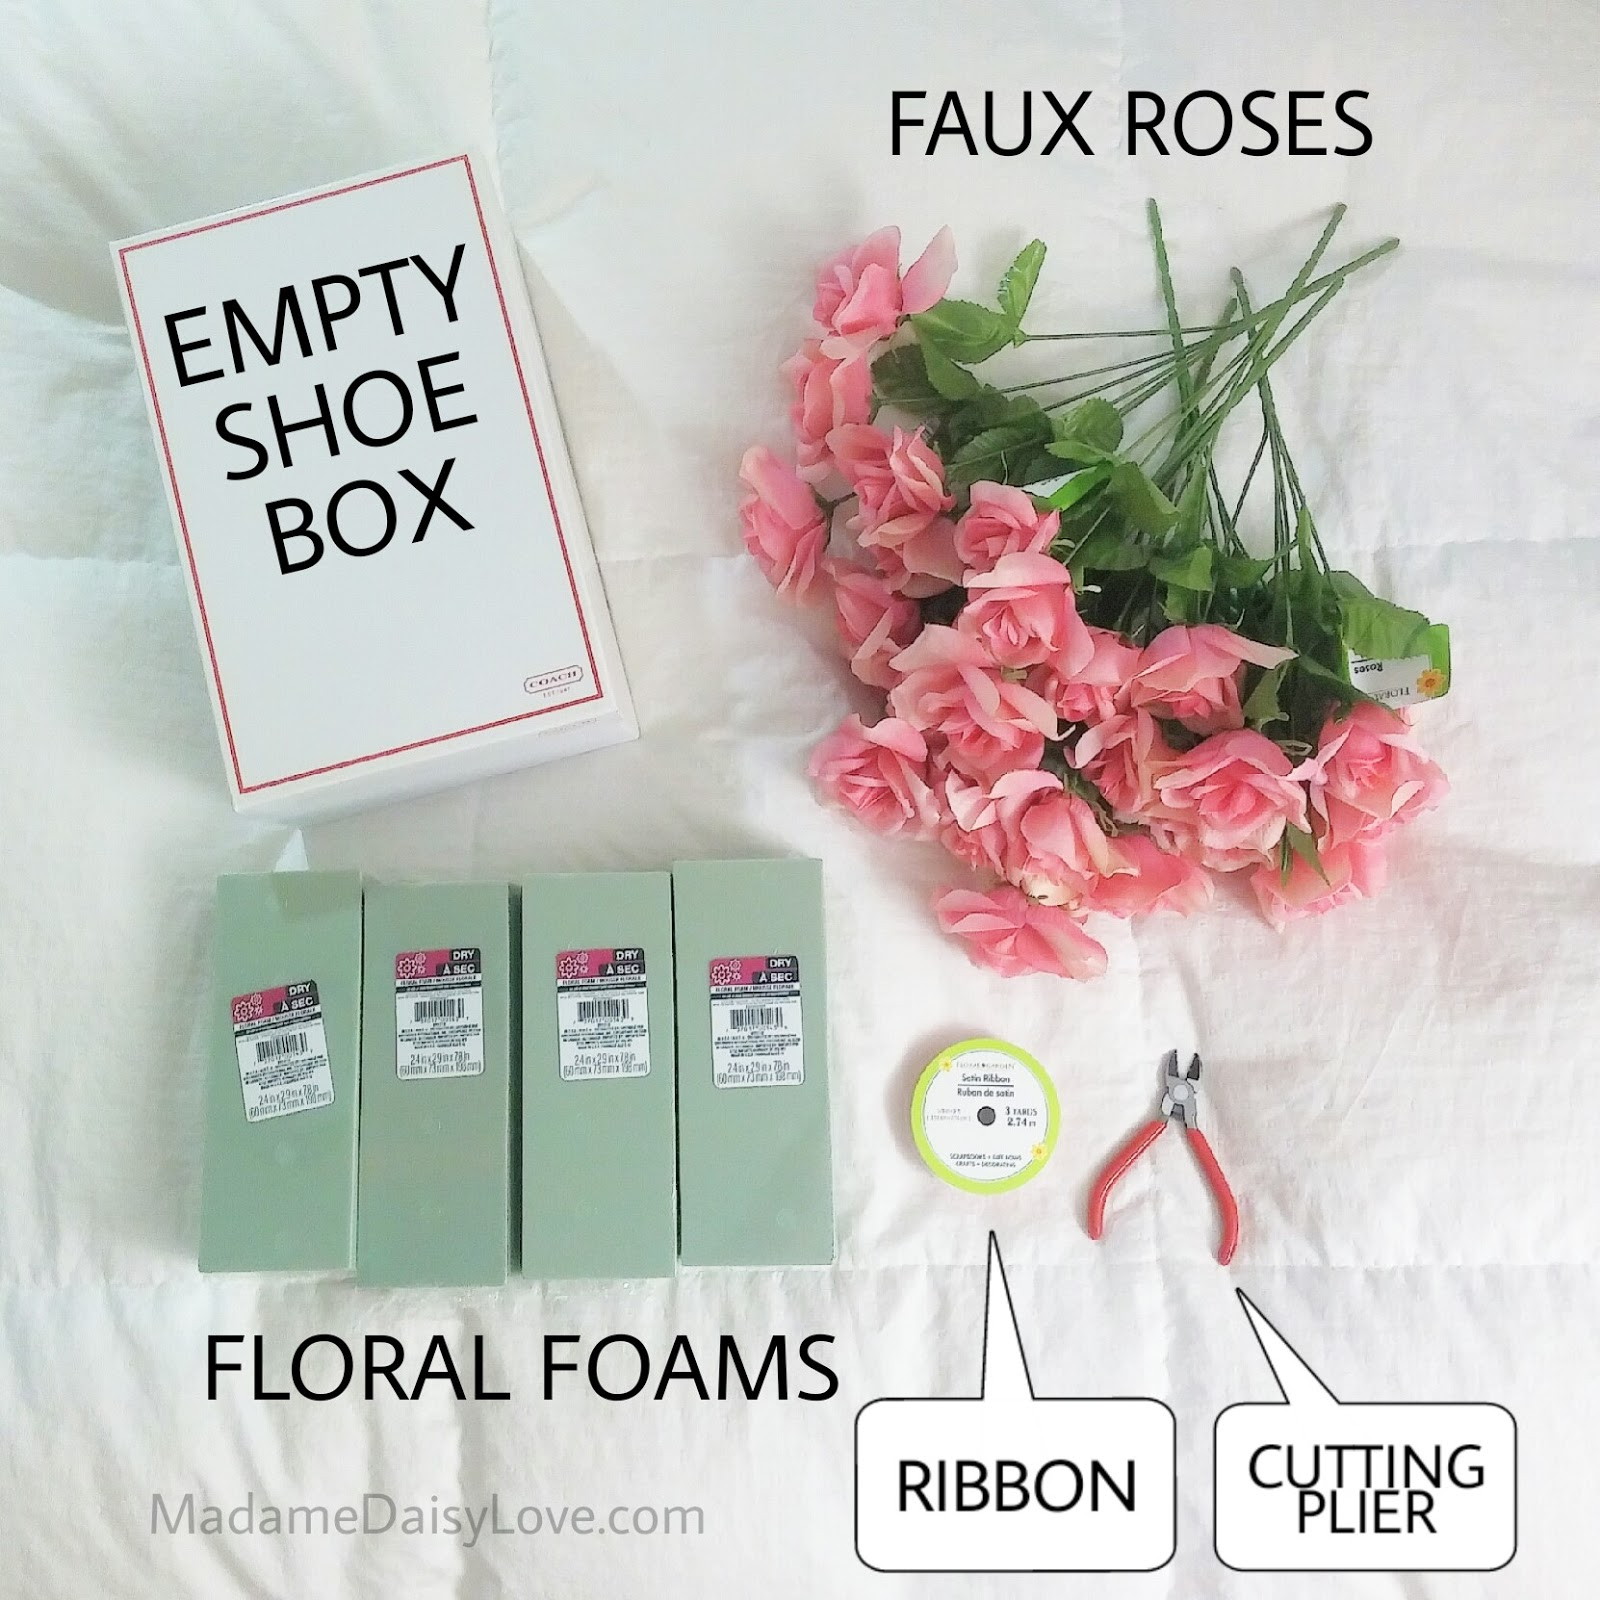 Diy Roses In A Box The Million Roses Venus Et Fleur Inspired